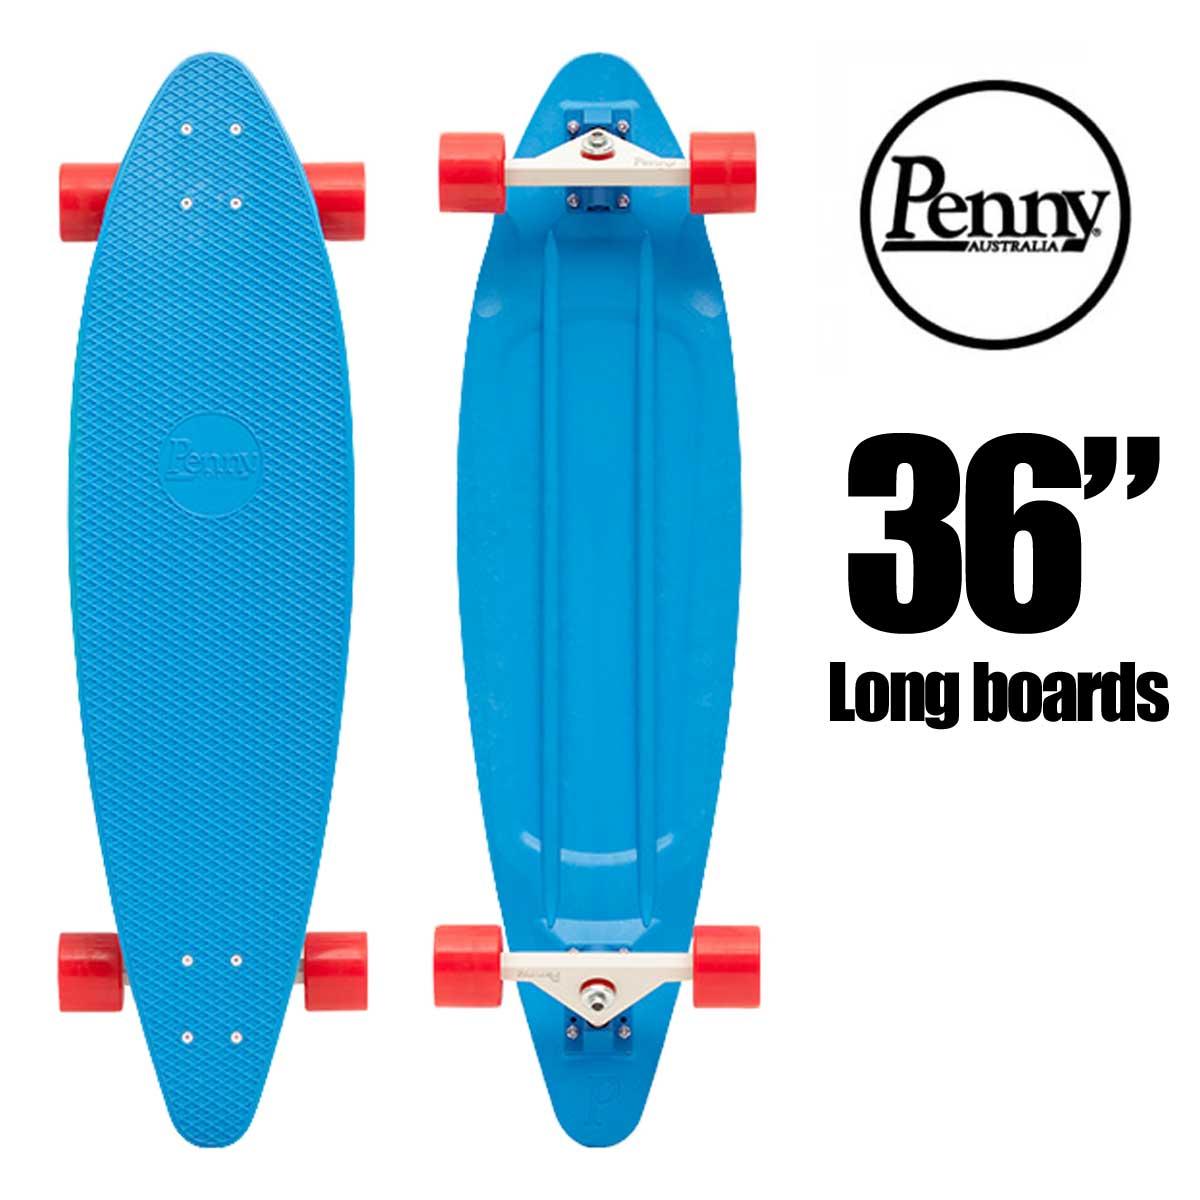 Panny skateboards Long boards 36インチ/ペニースケートボード ロングボード